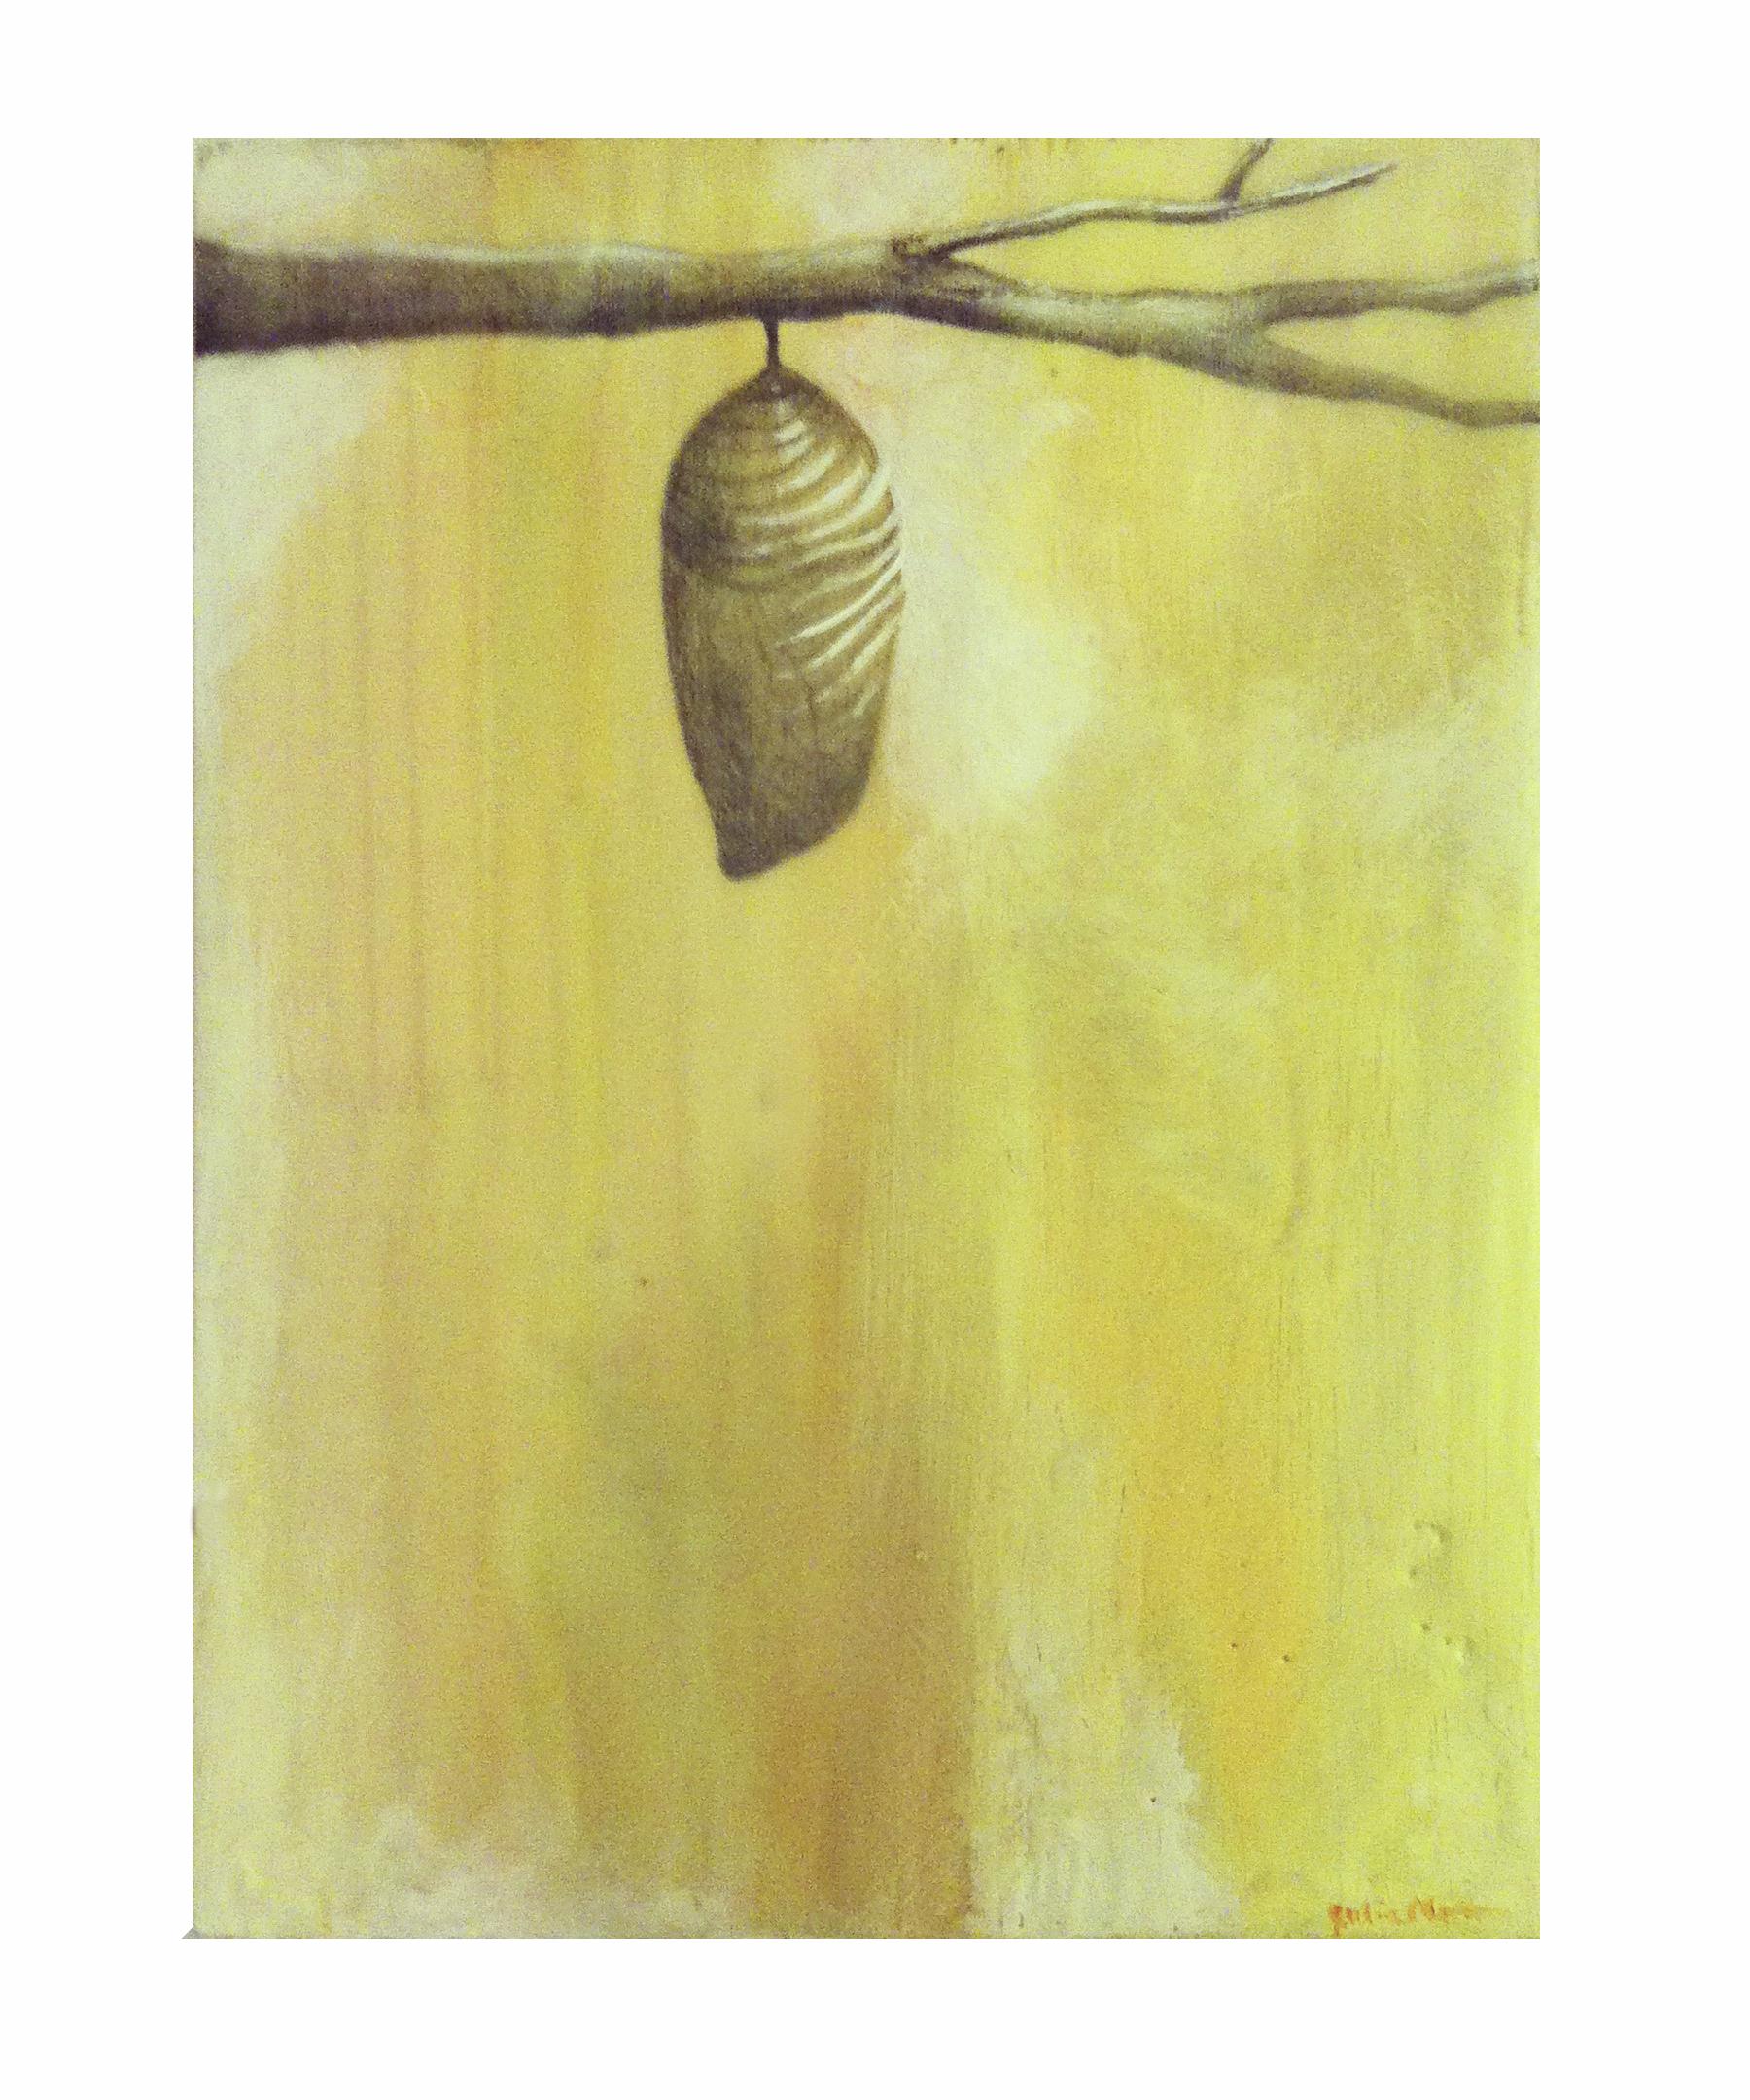 Paintings and Prints | Julie Maida